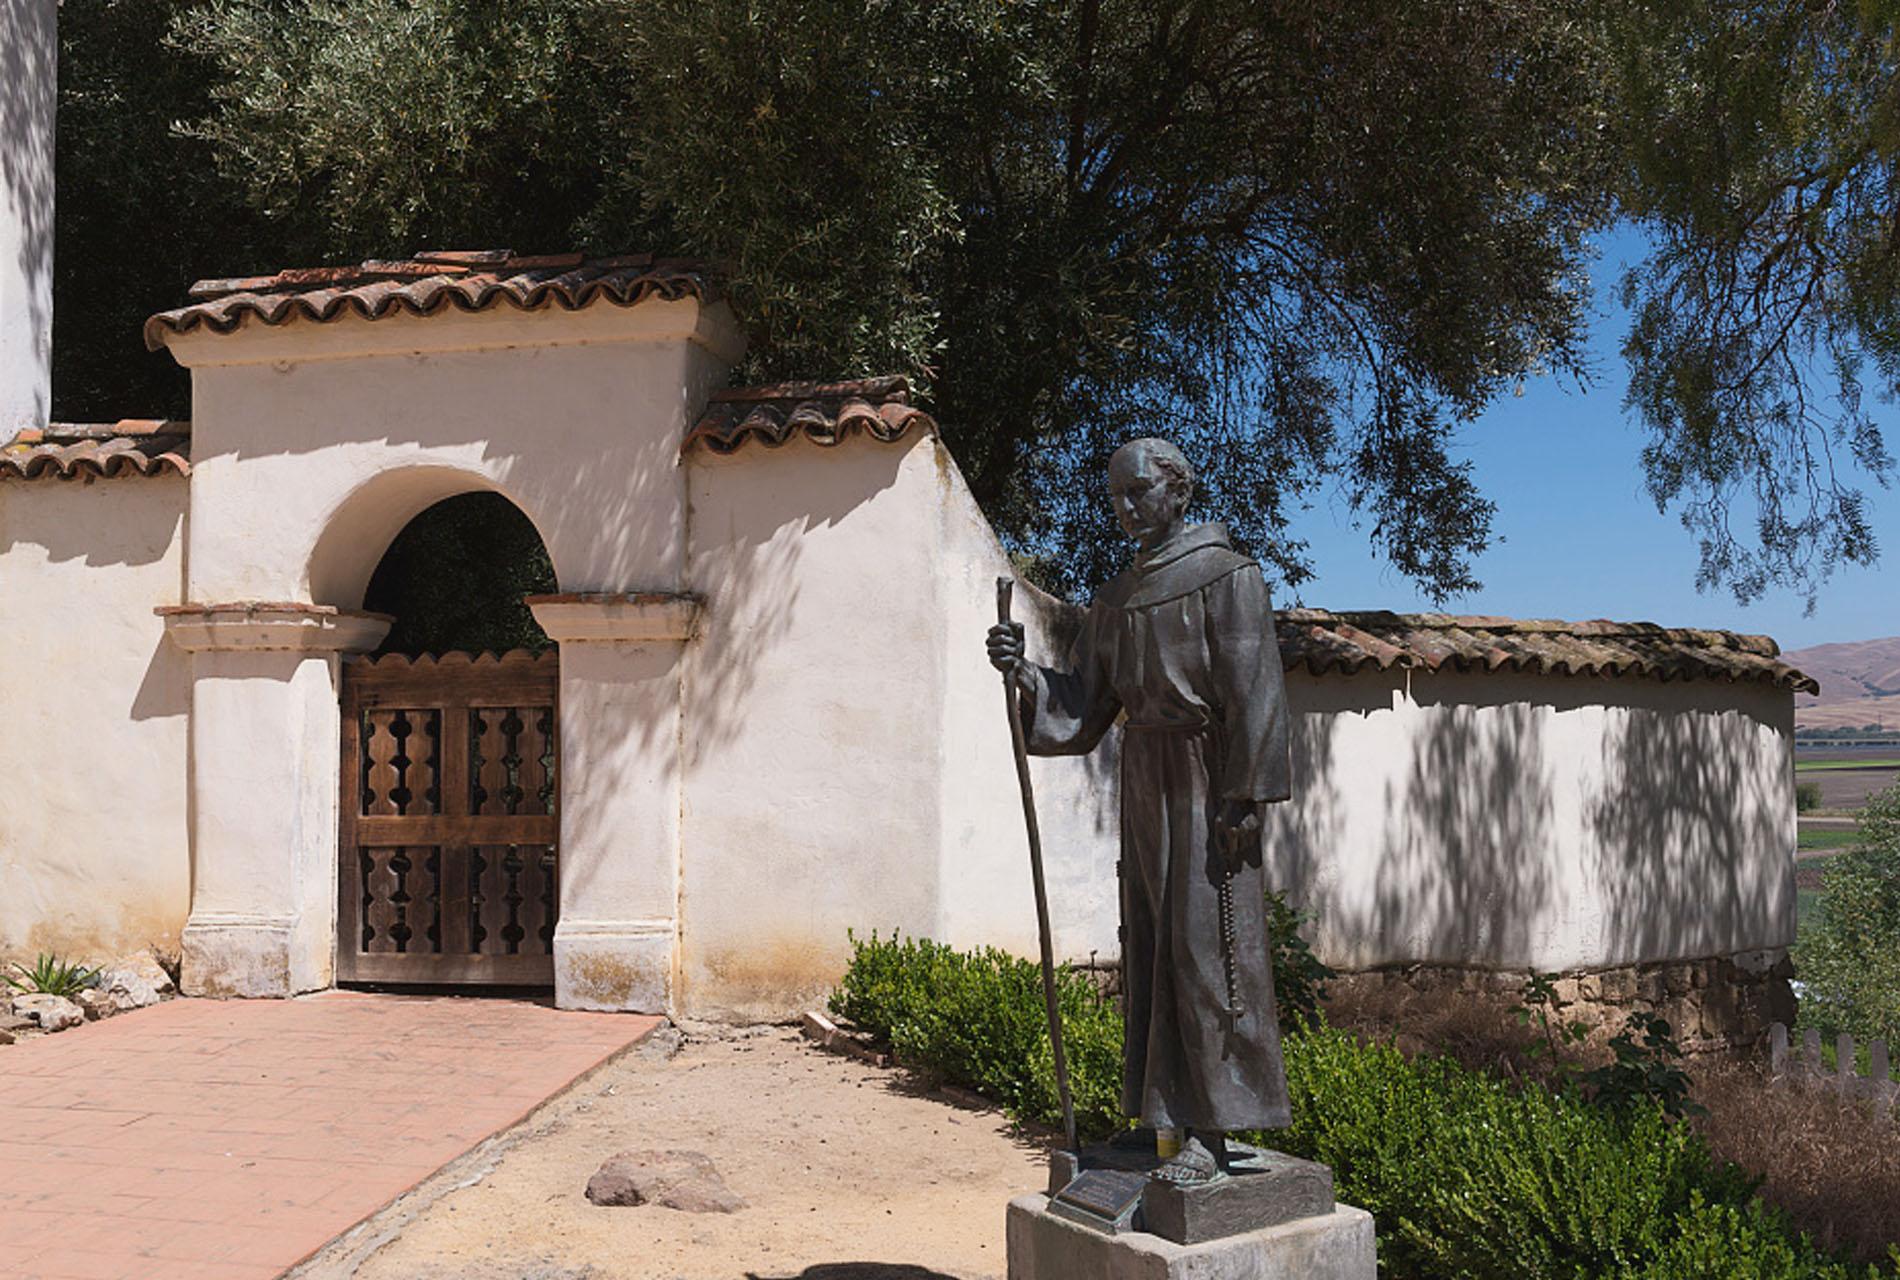 A statue of Father Junípero Serra at Old Mission San Juan Bautista in San Juan Bautista, San Benito County, California.